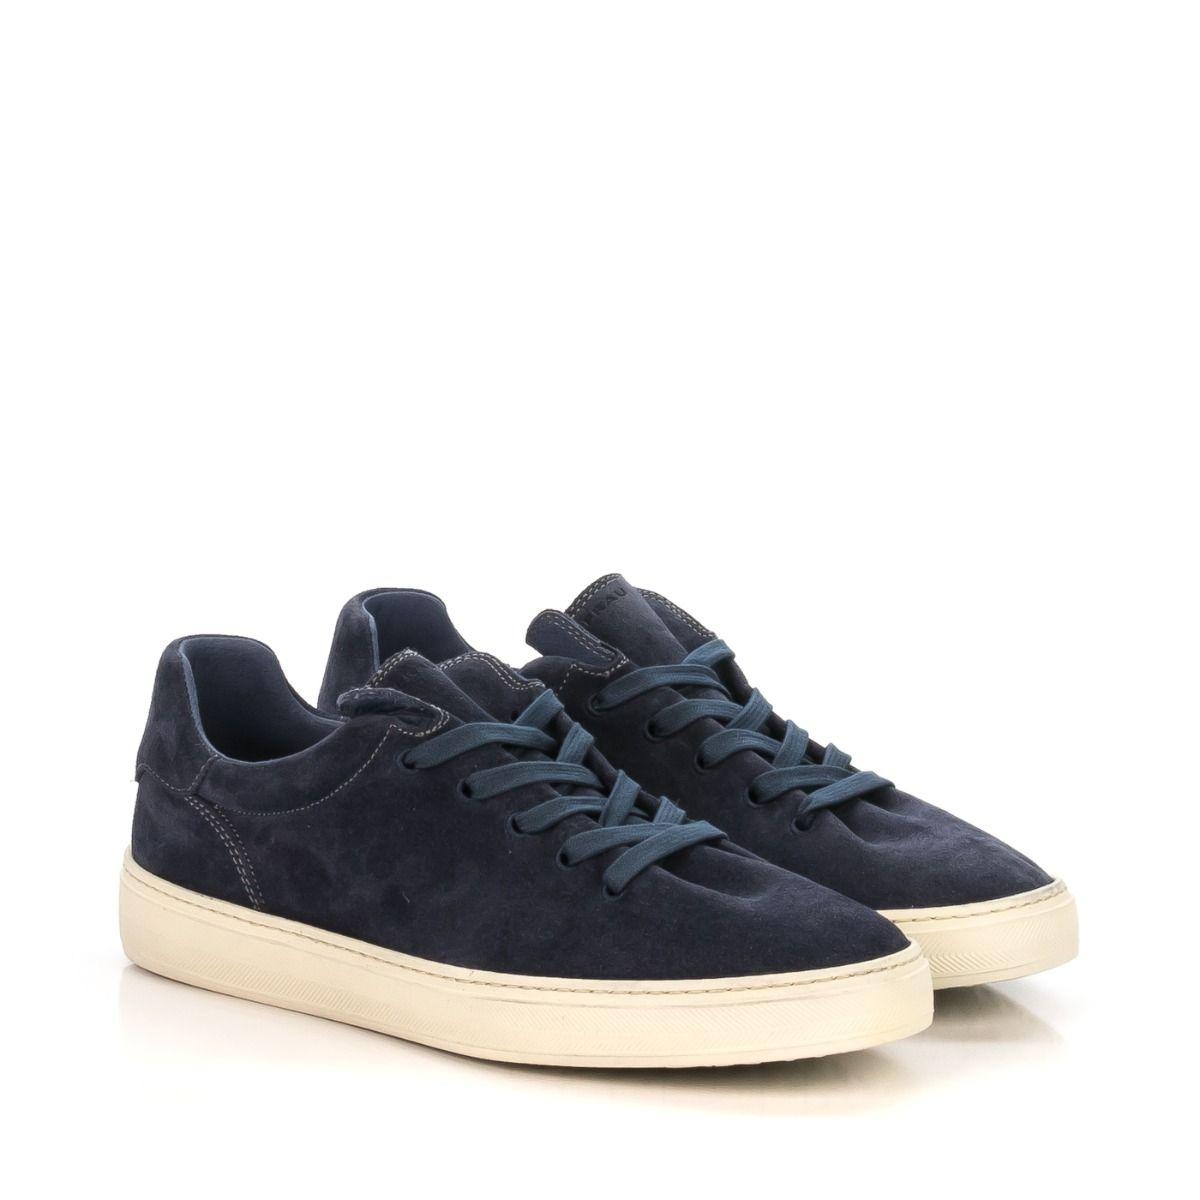 Blu Jeans Qaz00wxt Camoscio 28a8 In Spedizione Sneakers Frau Da Uomo PTkuZiOX